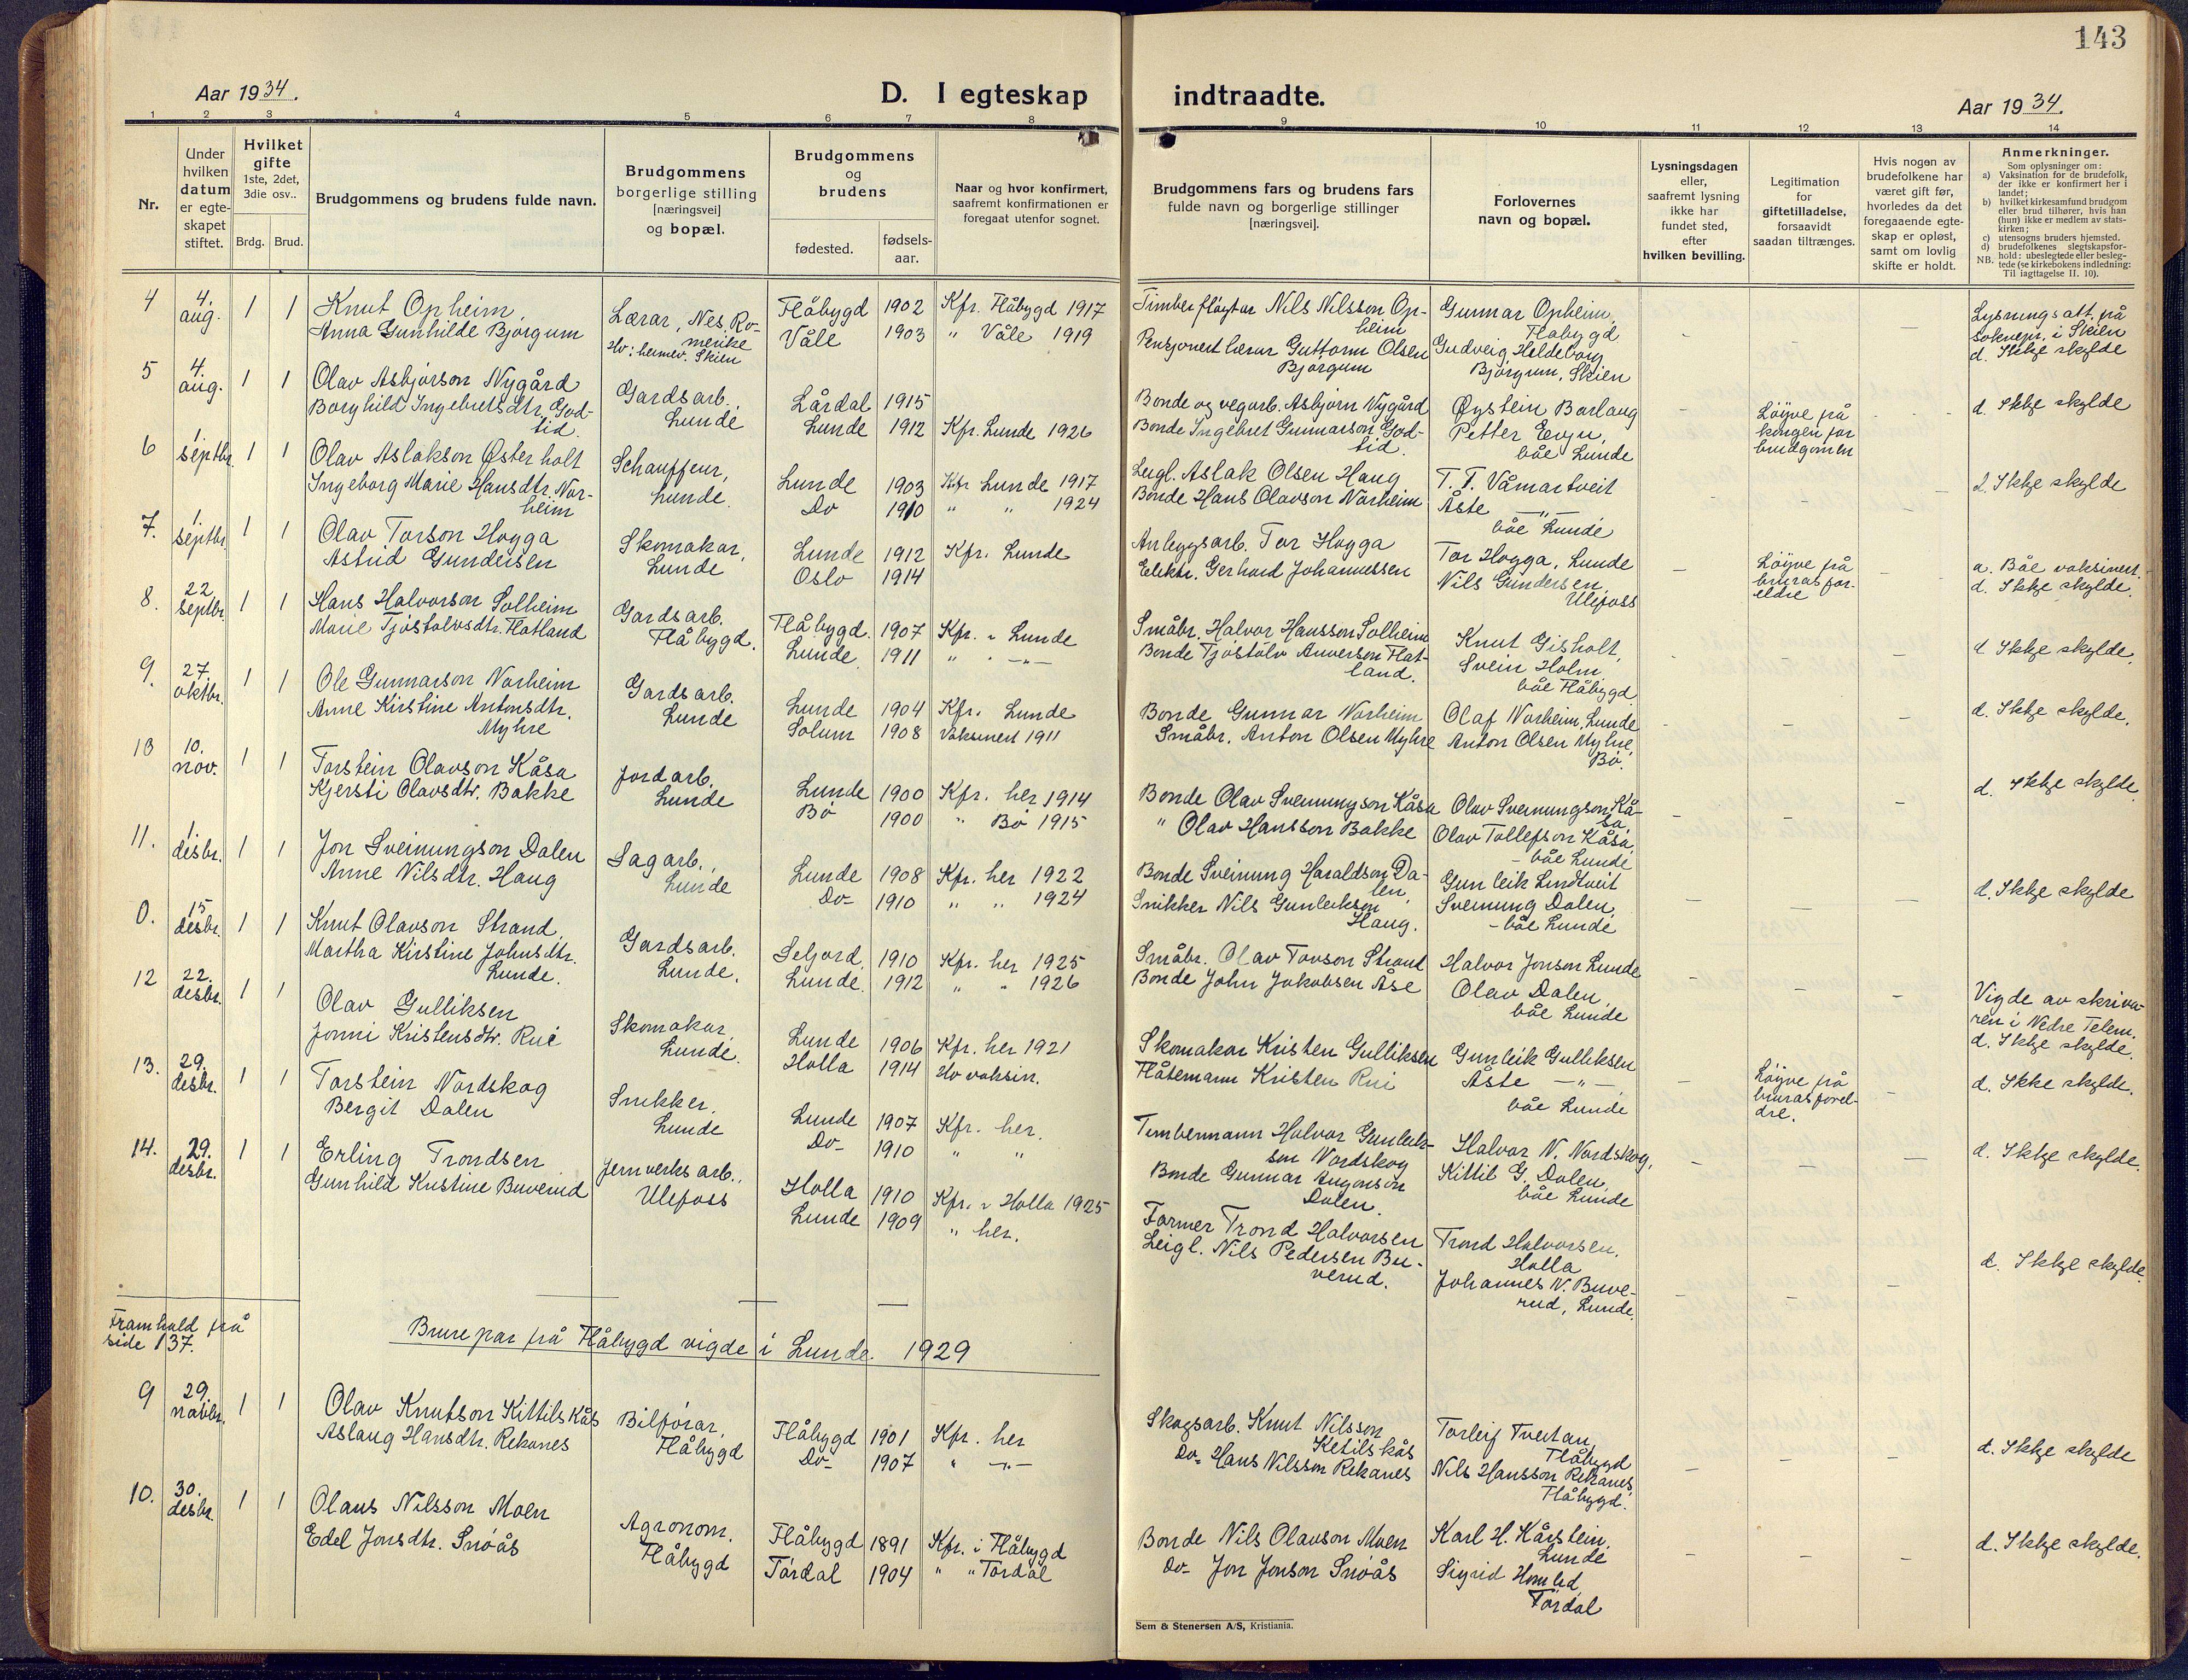 SAKO, Lunde kirkebøker, F/Fa/L0006: Ministerialbok nr. I 6, 1922-1940, s. 143